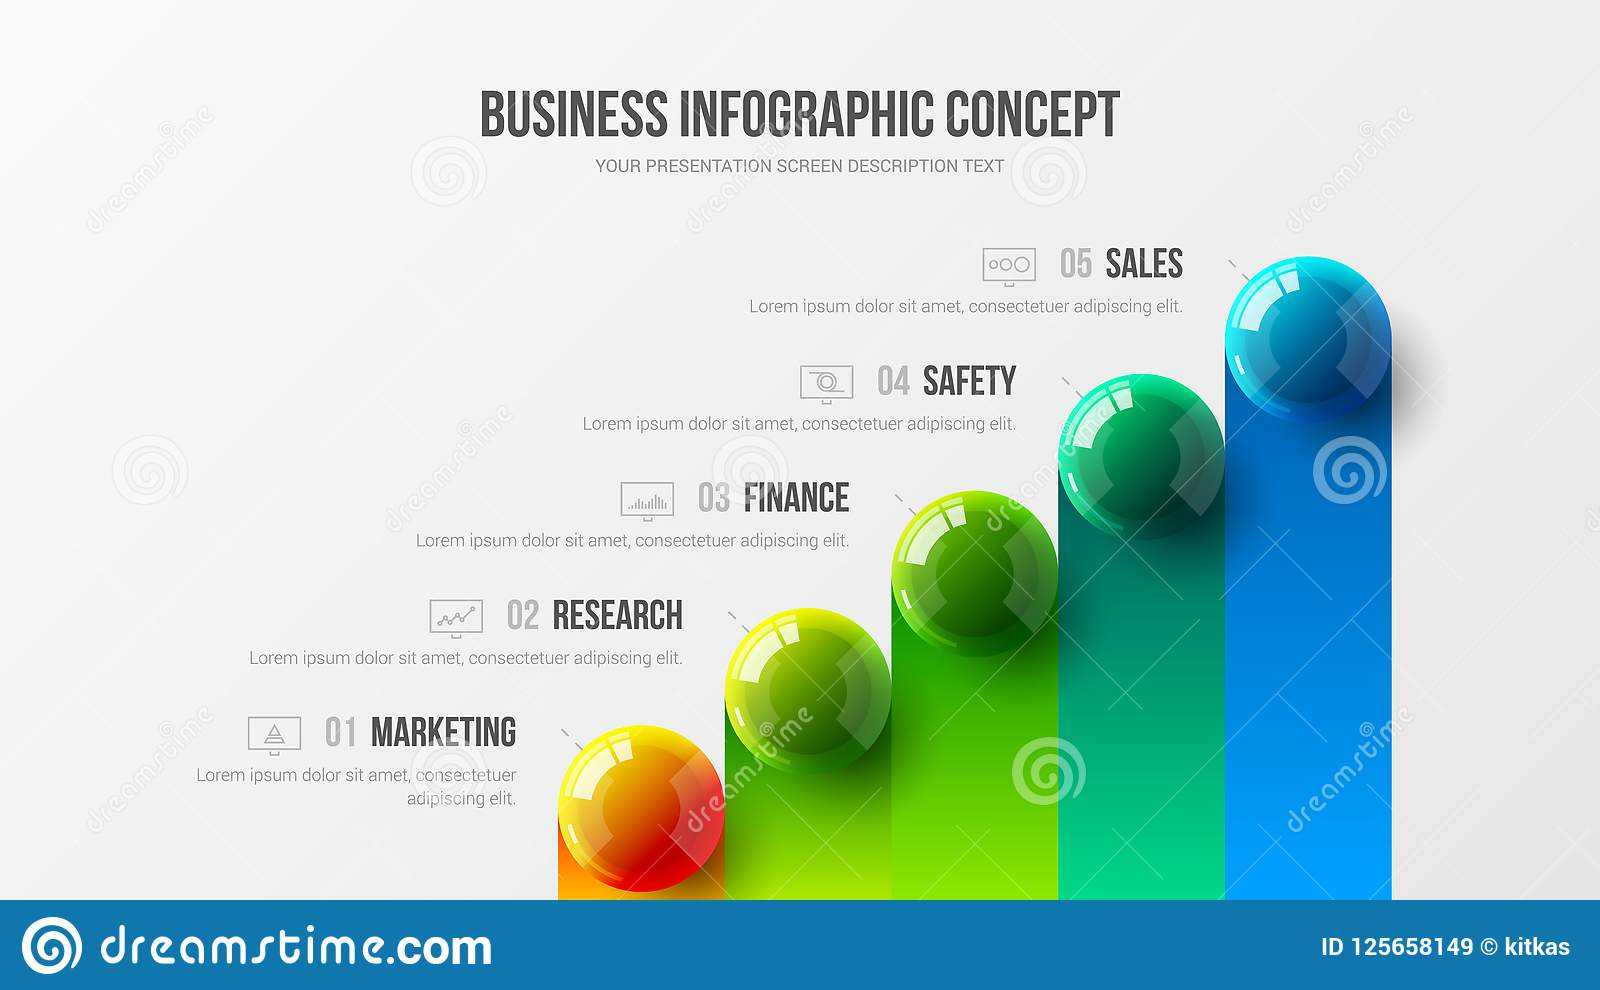 Amazing business infographic presentation vector illustration concept. Corporate marketing analytics data report creative design l